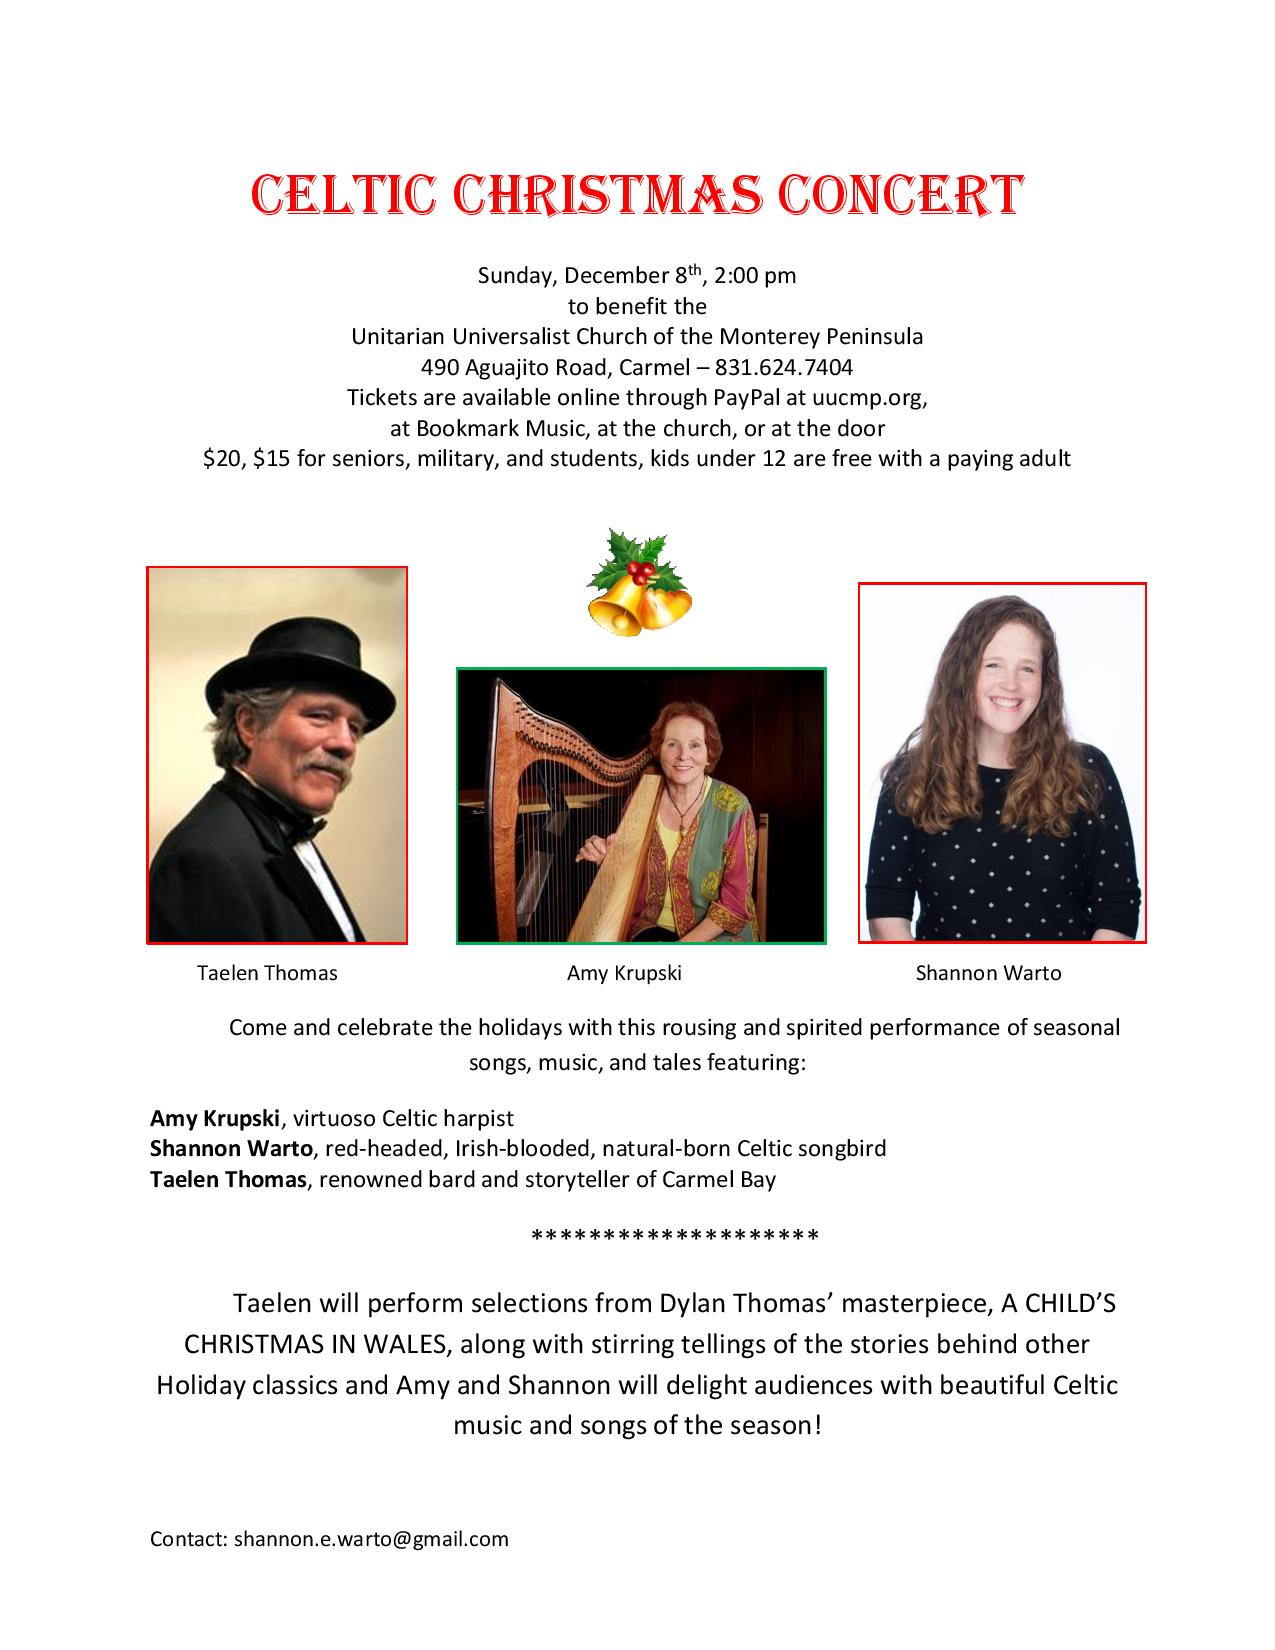 Celtic Christmas Concert Dec 8th at 2 PM